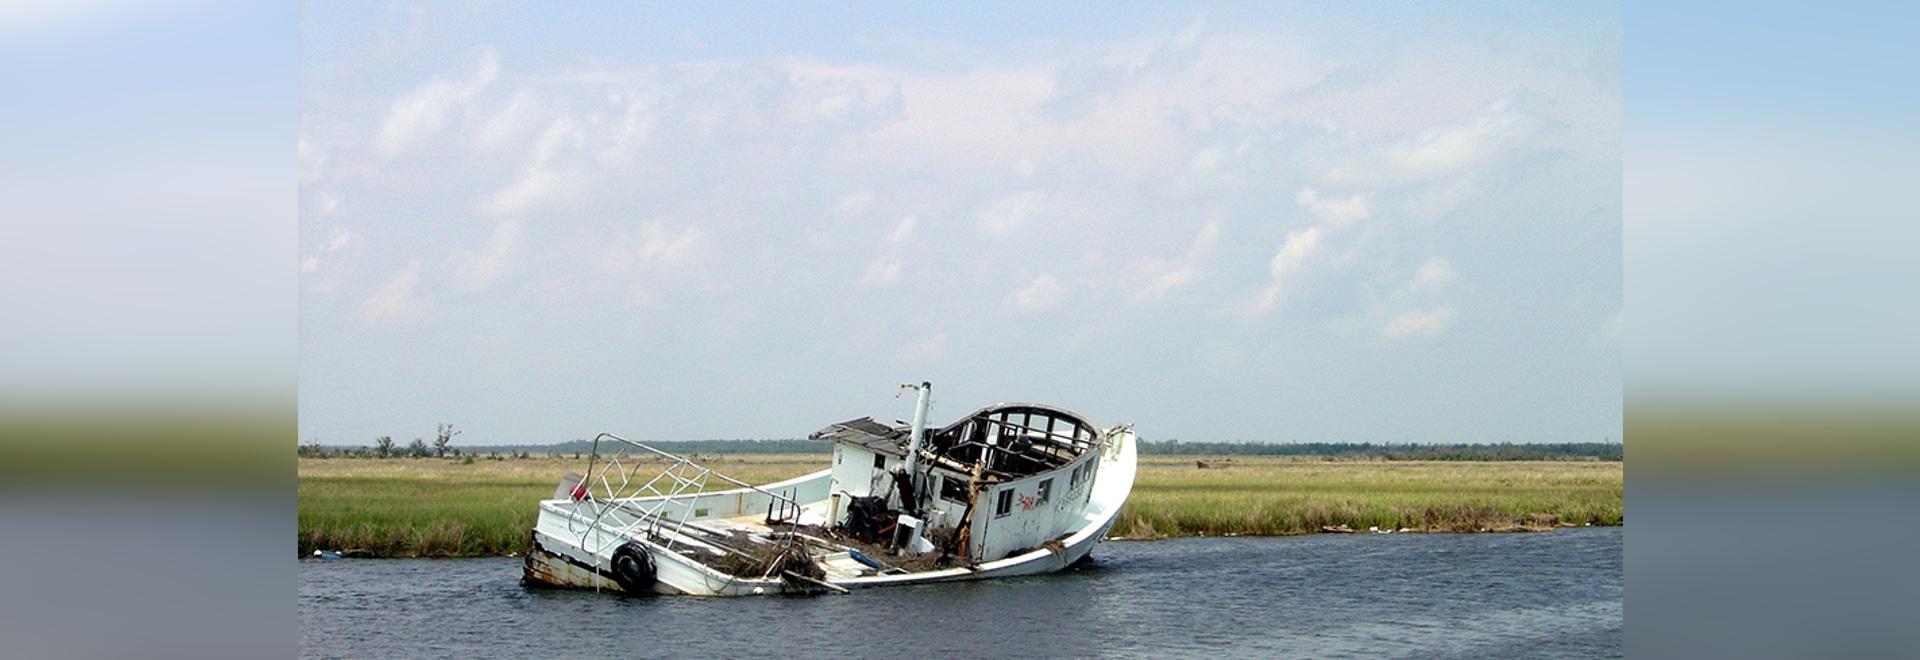 ADV in Louisiana